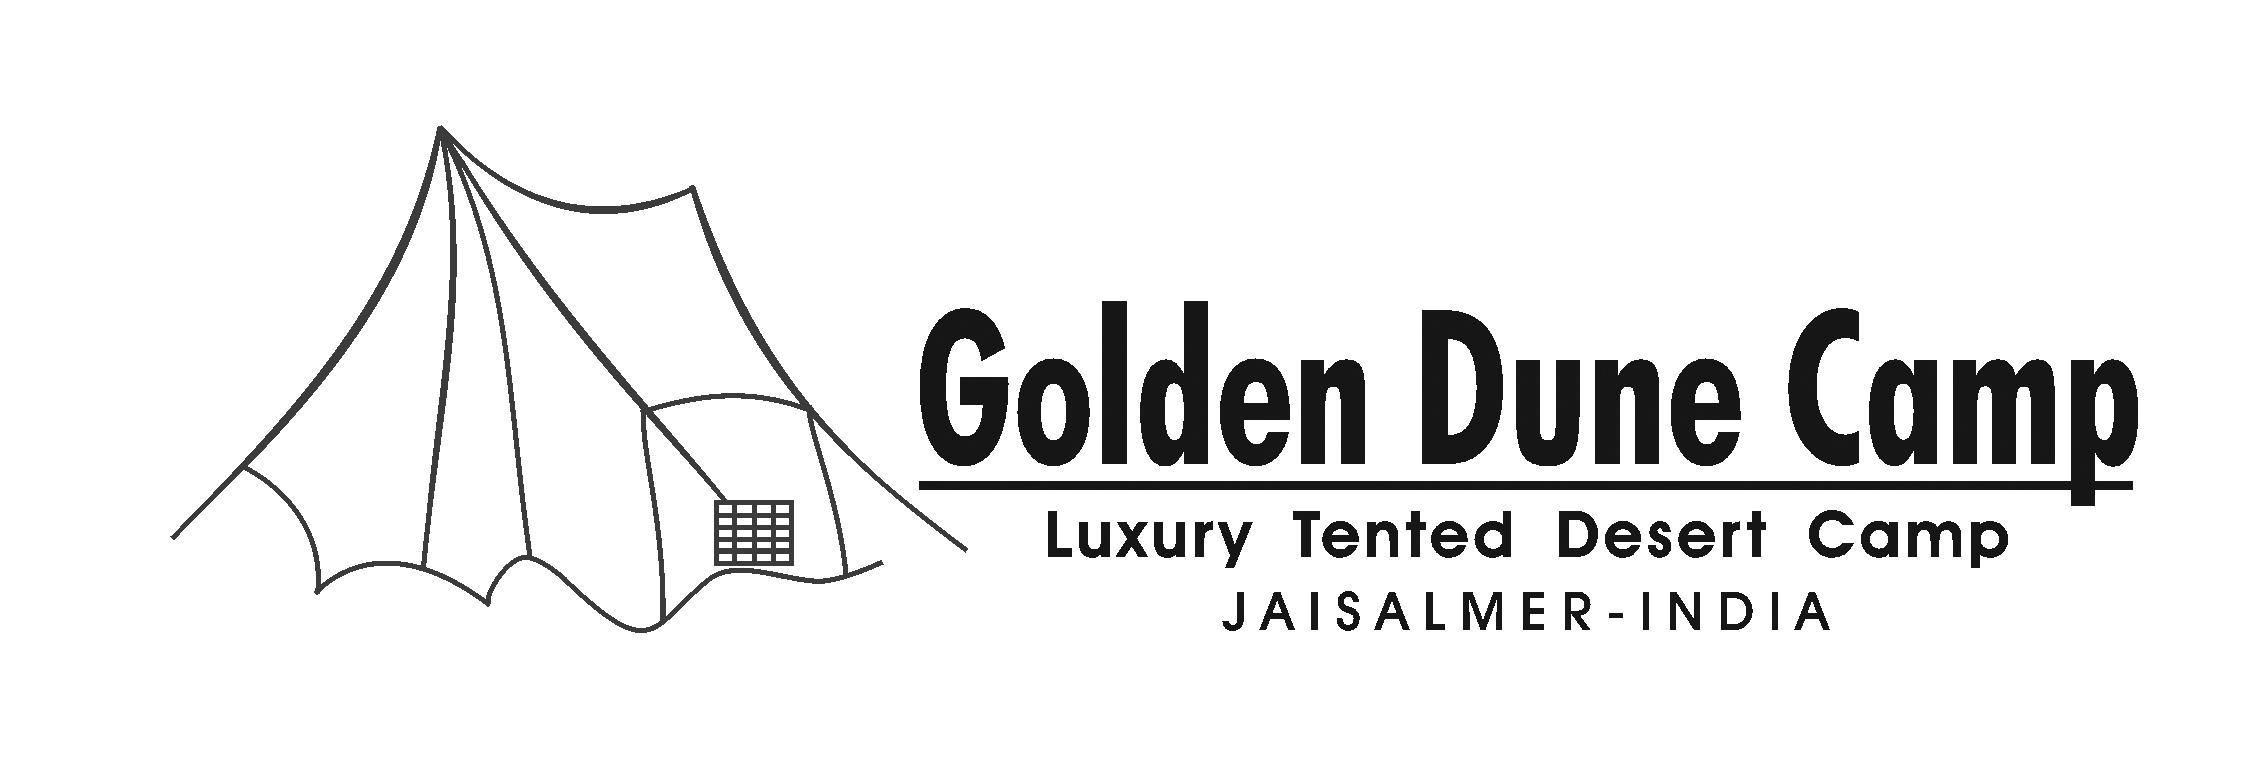 Golden Dune Camp - Gandhi Colony - Jaisalmer Image